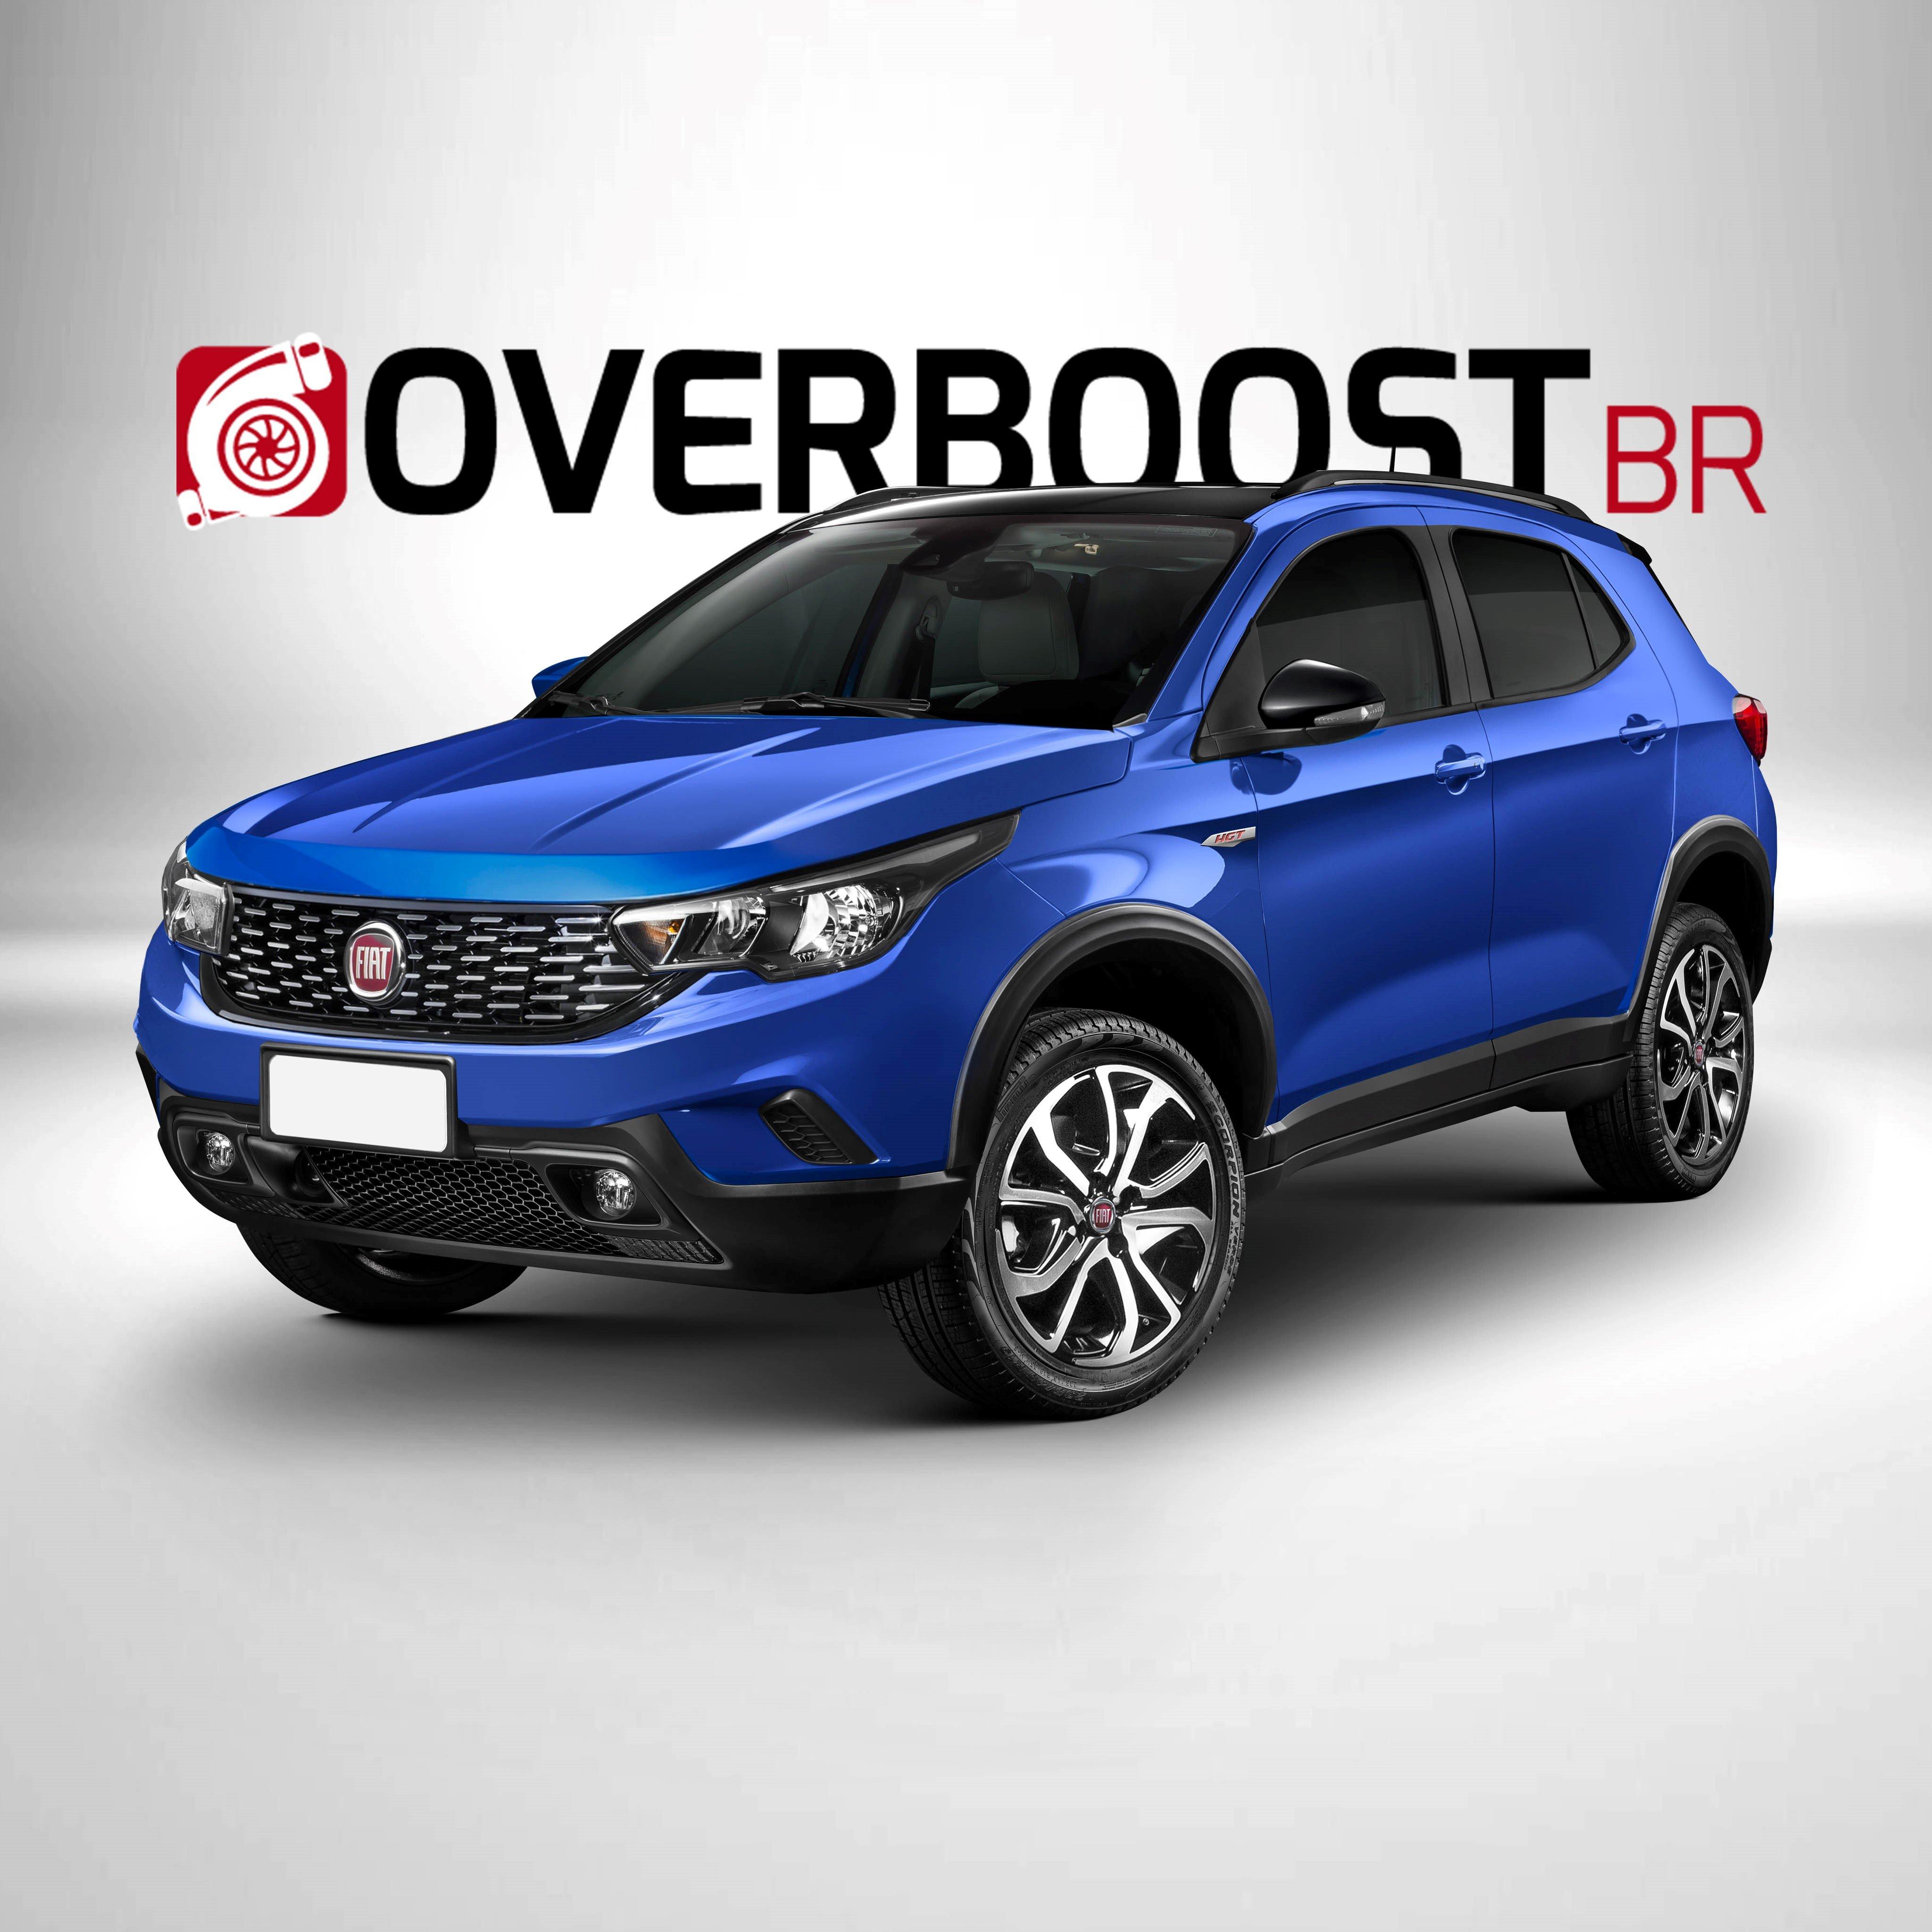 Novo modelo da Fiat, SUV baseado no Argo chega no segundo semestre